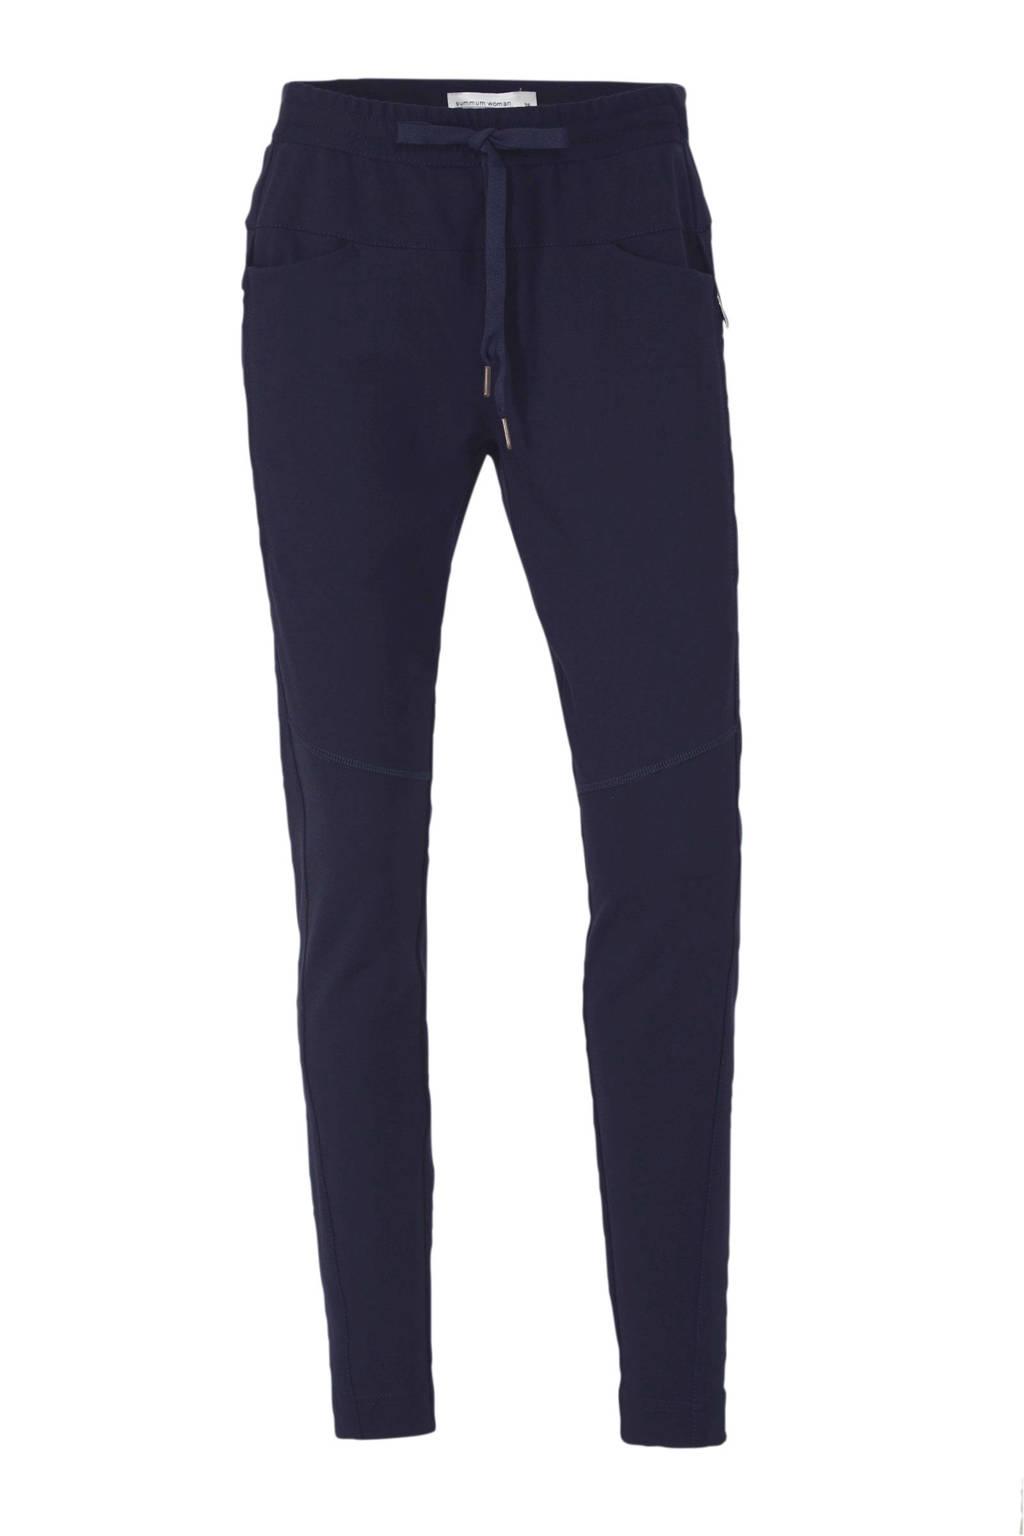 Summum Woman slim fit broek donkerblauw, Donkerblauw